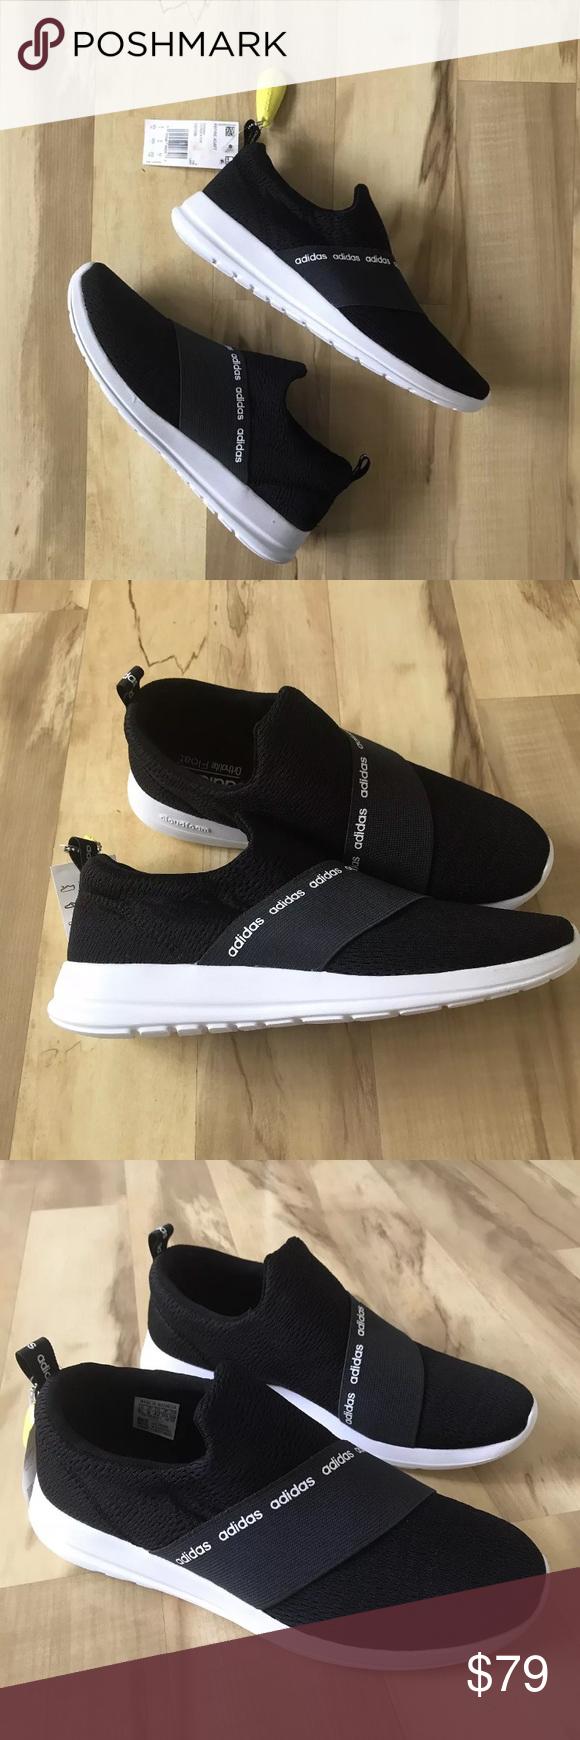 síndrome fiabilidad papelería  adidas Cloudfoam Refine Adapt Shoe Size 9 1/2 New | Adidas cloudfoam women, Adidas  cloudfoam, Shoes sneakers adidas